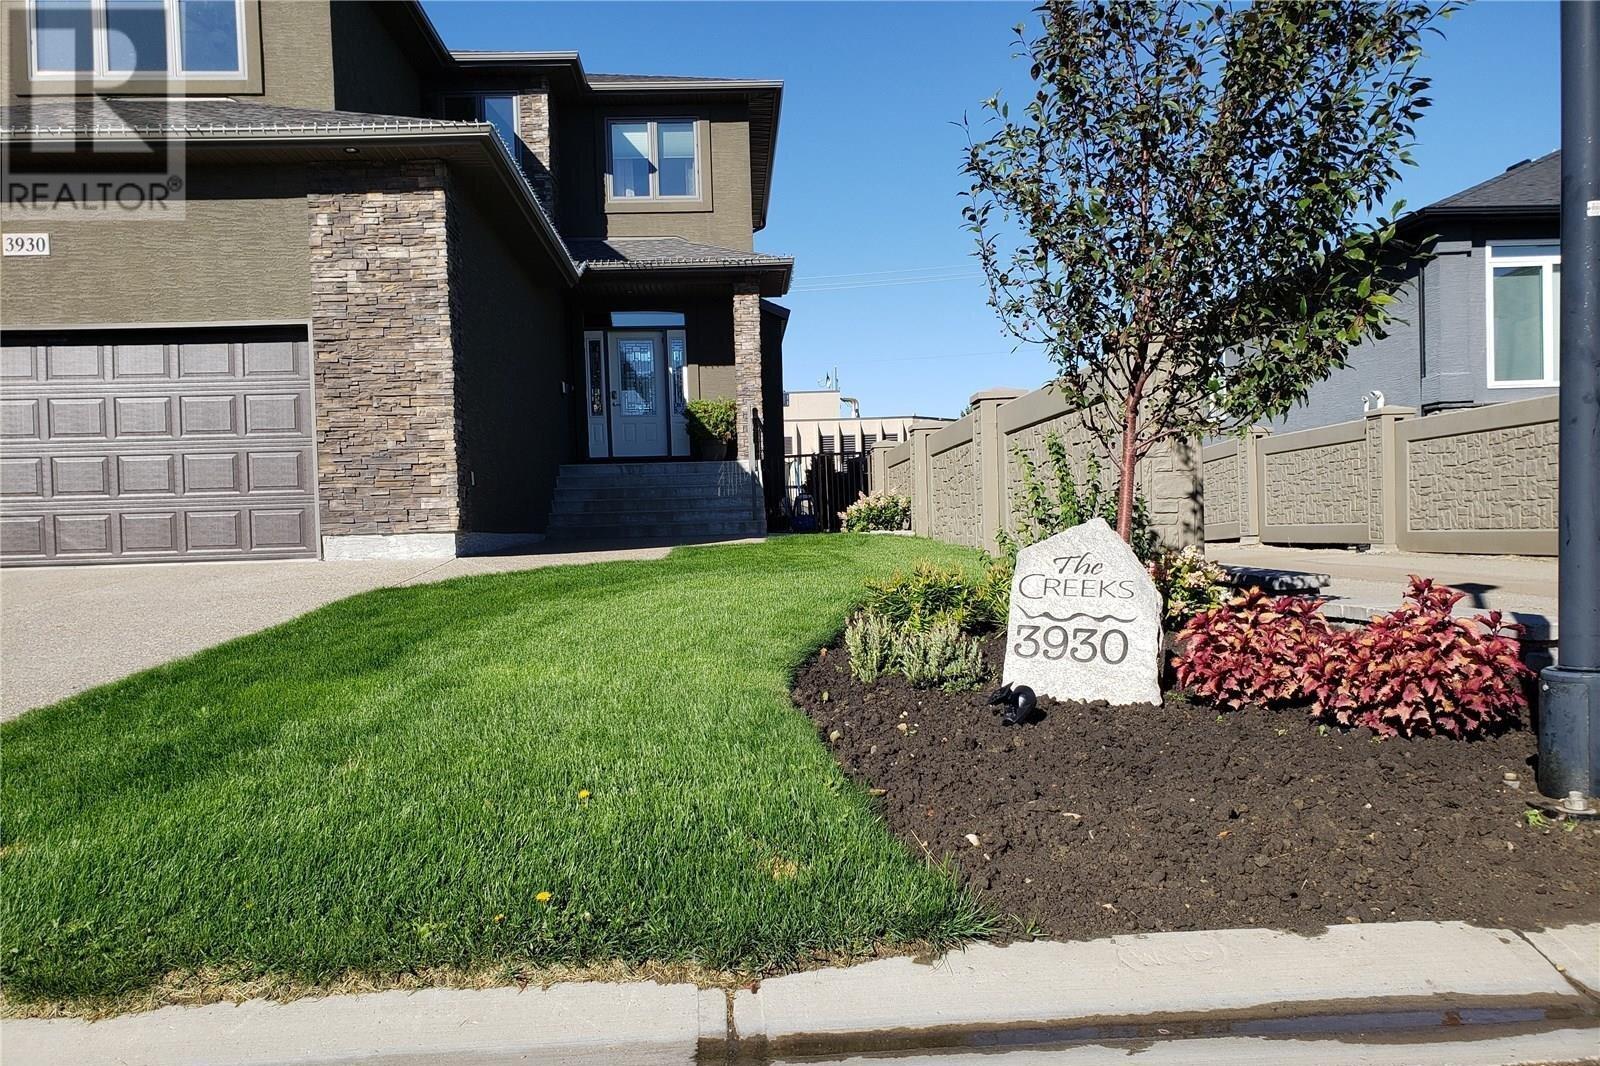 House for sale at 3930 Sandhill Cres Regina Saskatchewan - MLS: SK835944